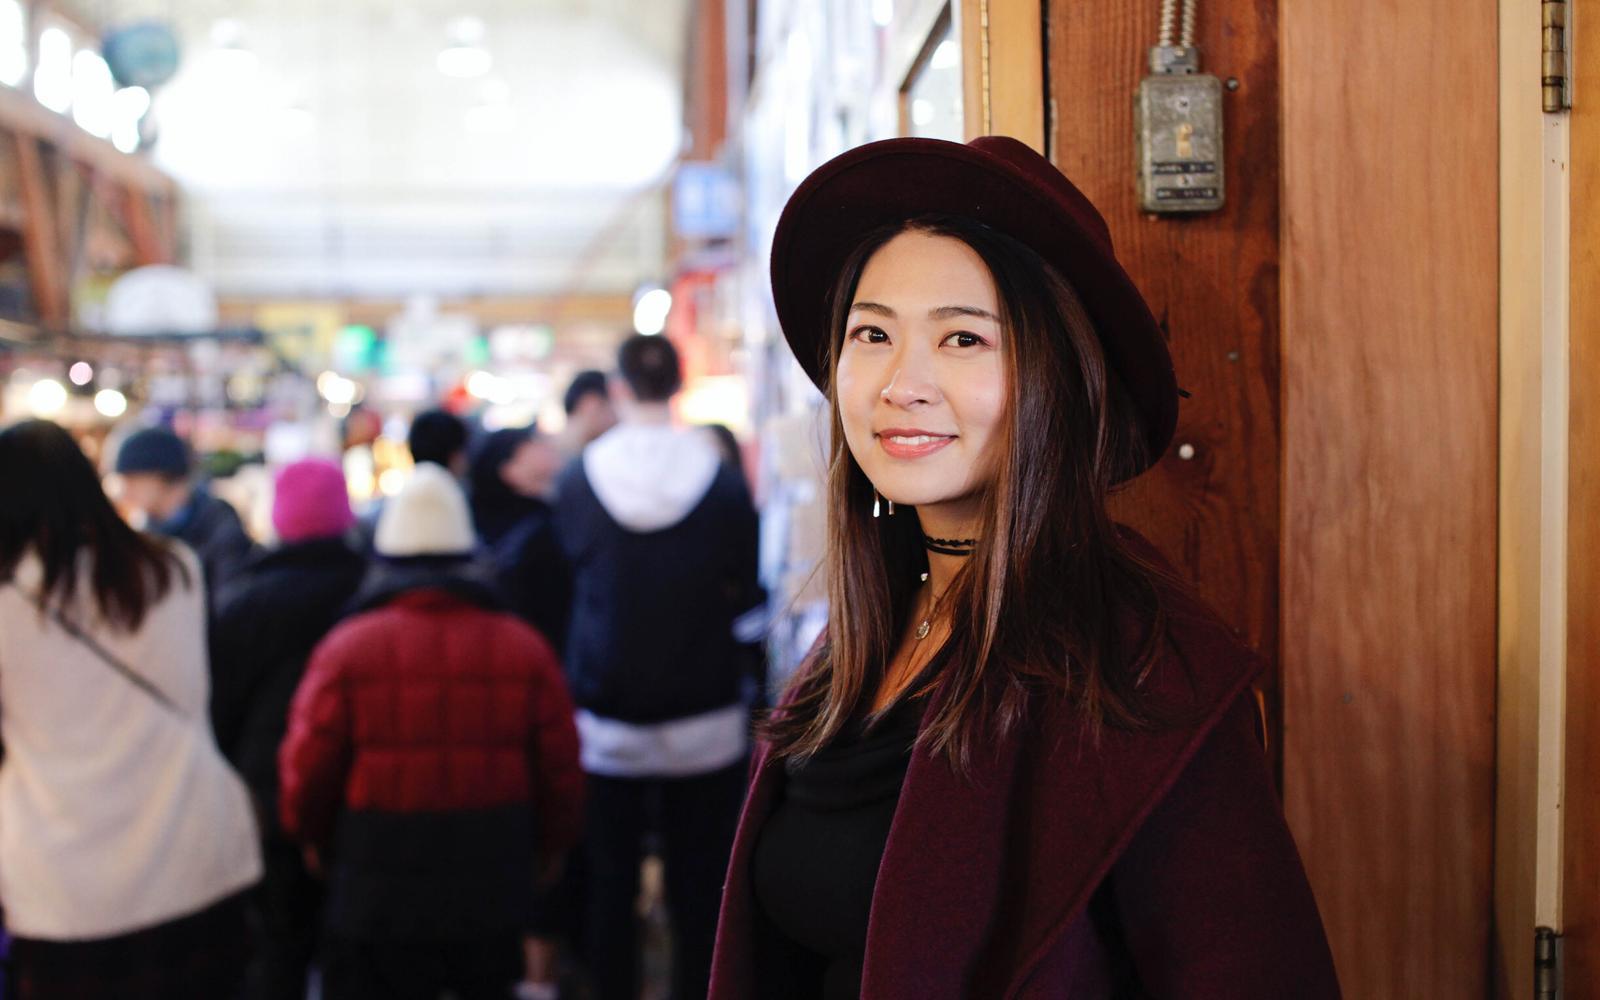 Bachelor of Hospitality Management Student, Betty Lan